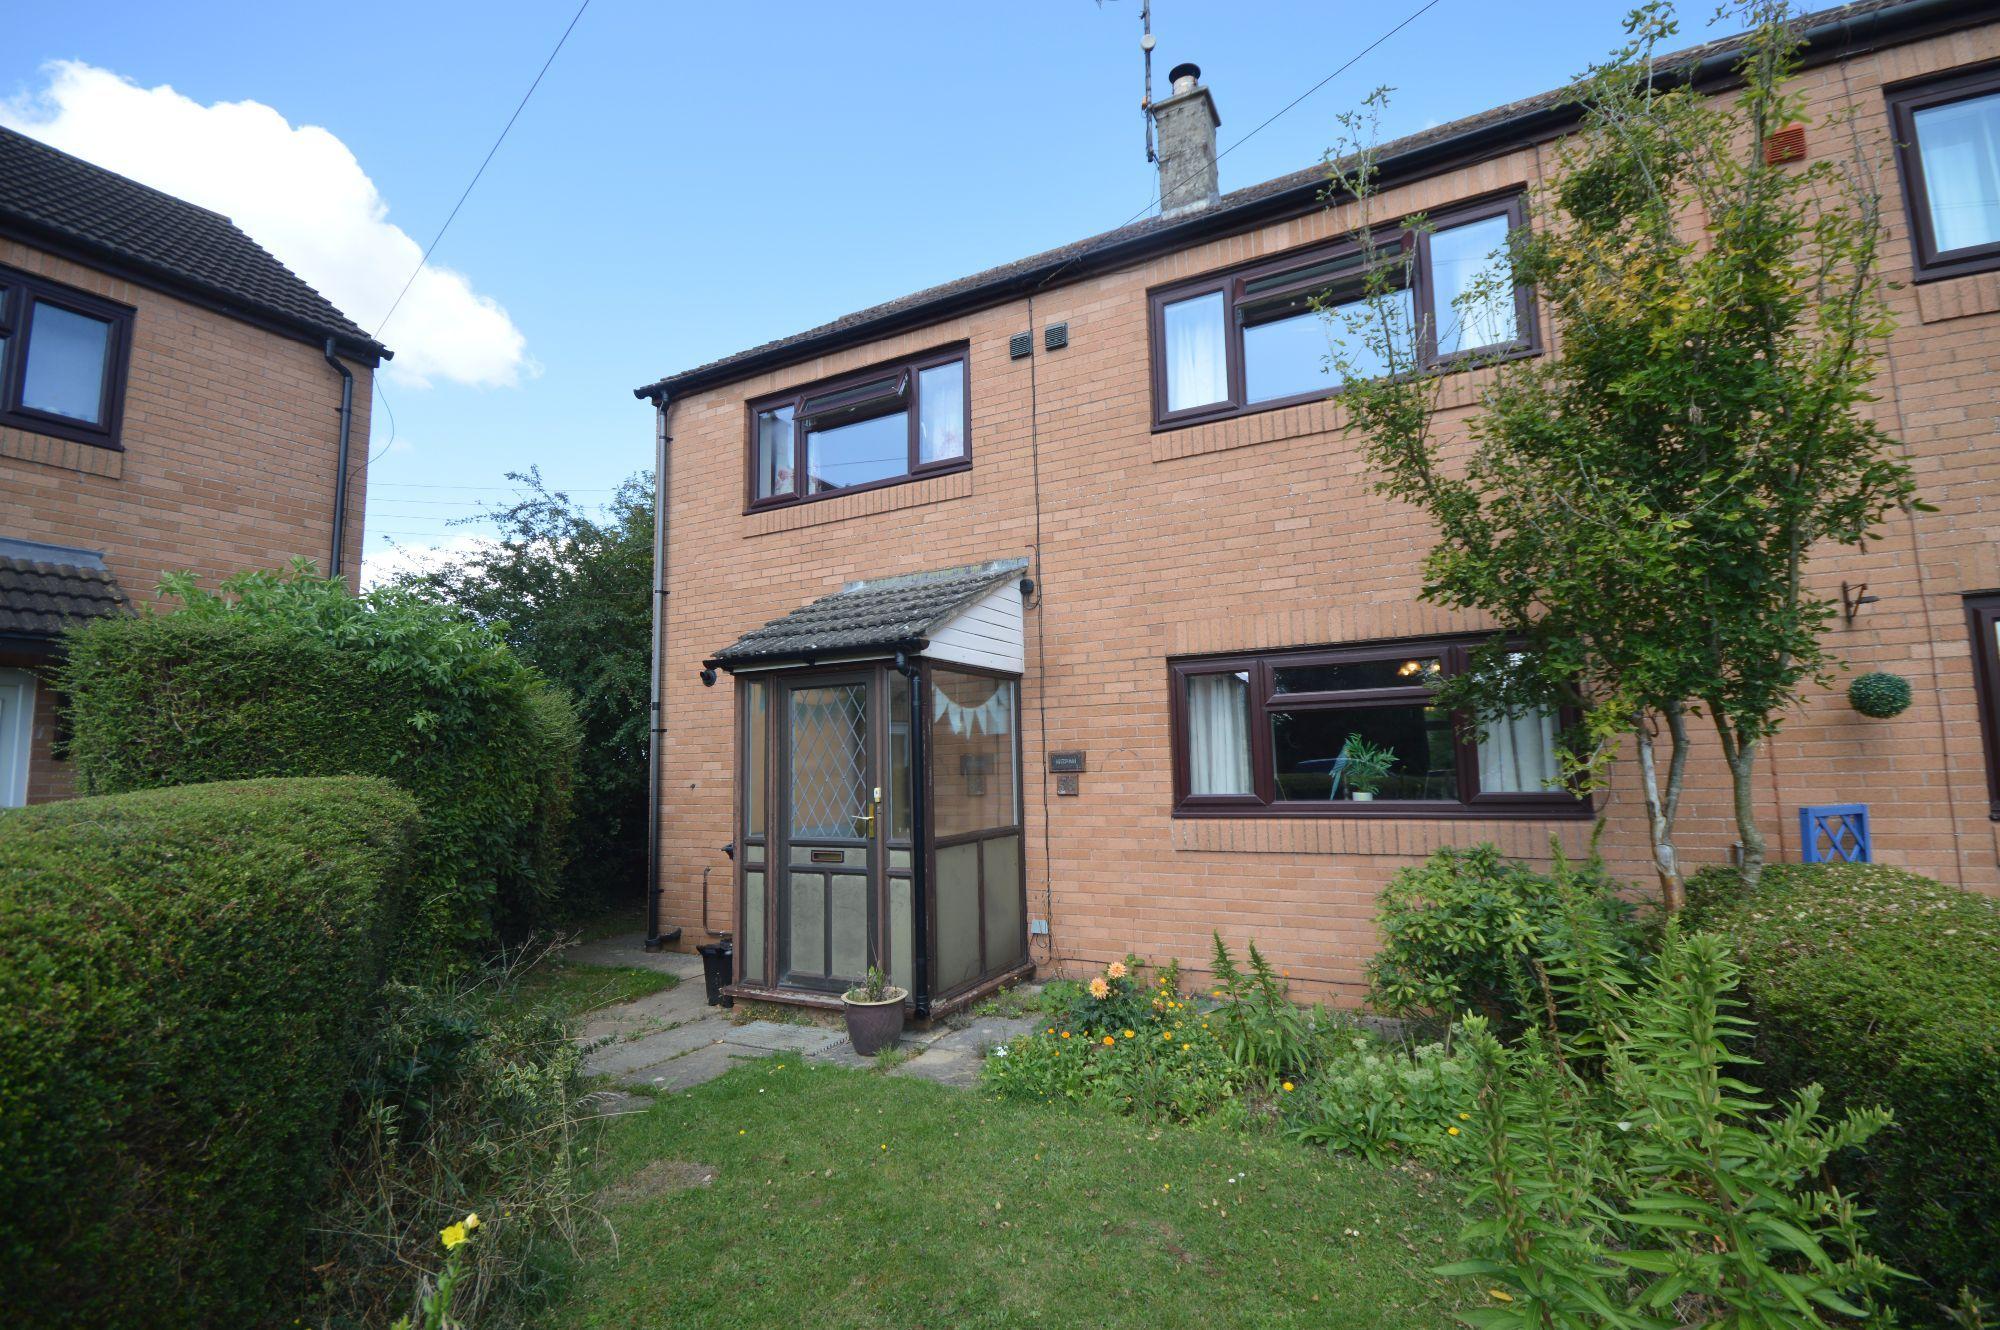 Property photo 1 of 14.